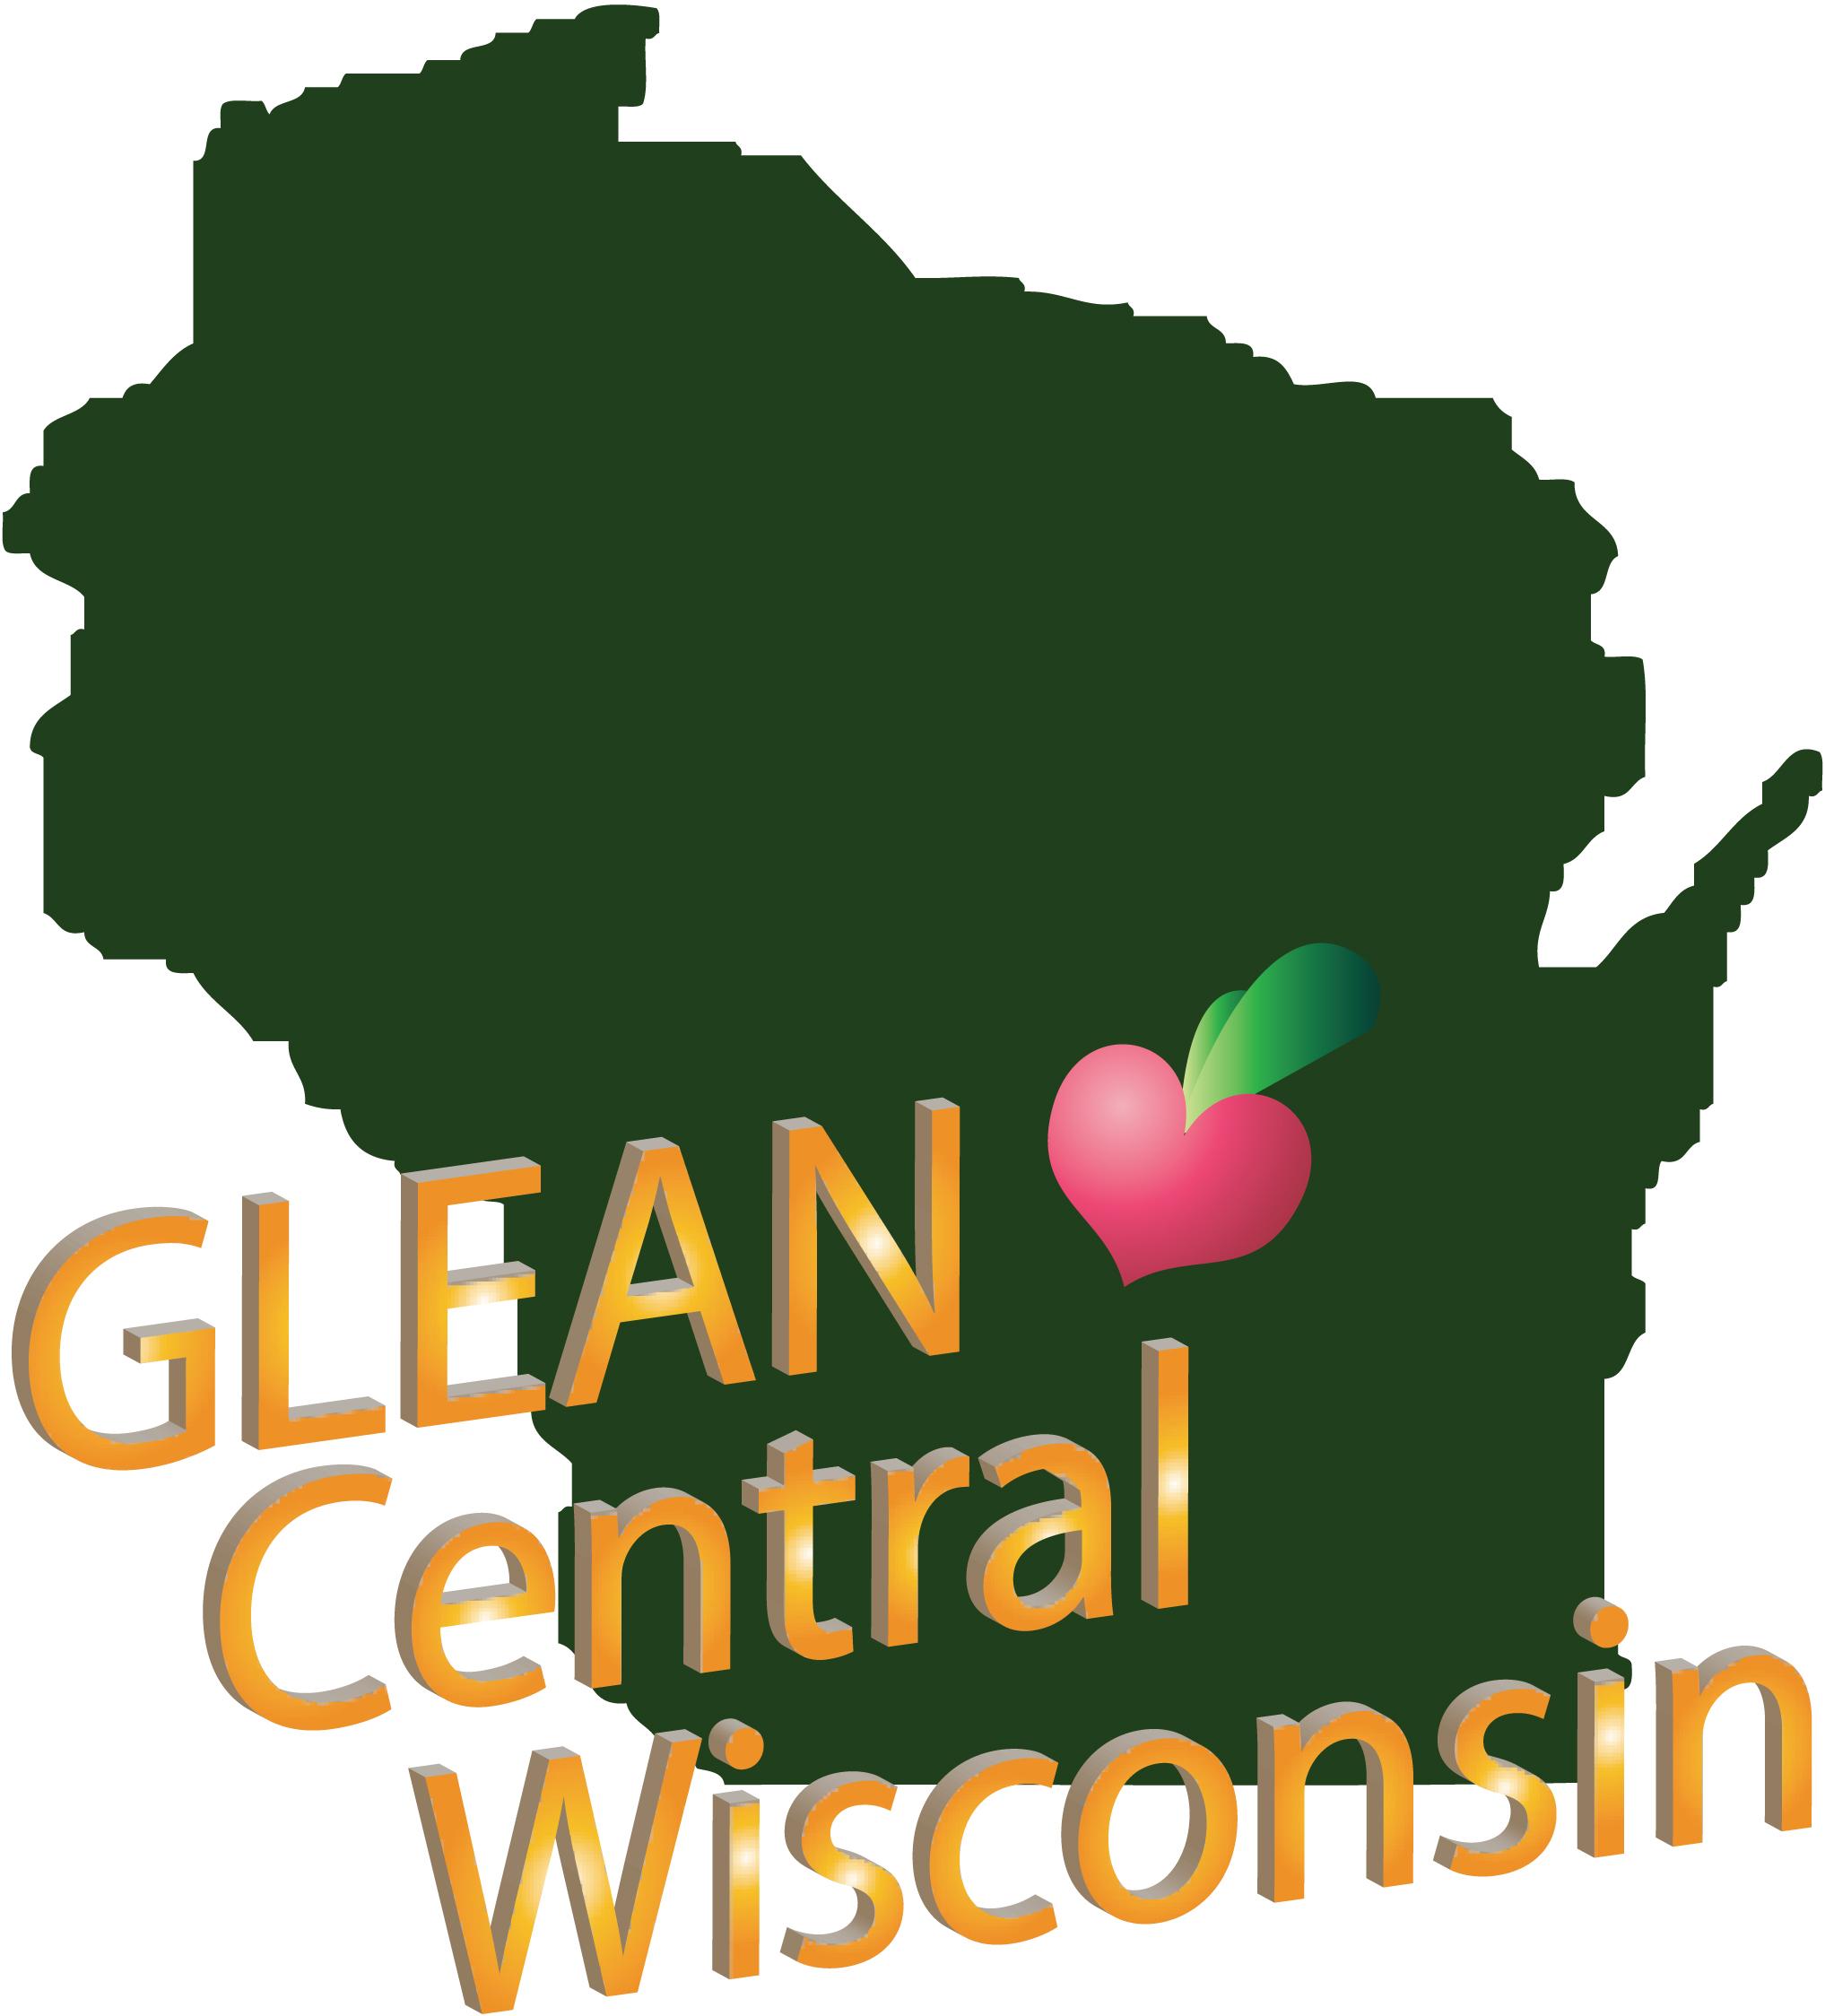 Glean Central Wisconsin logo.jpg